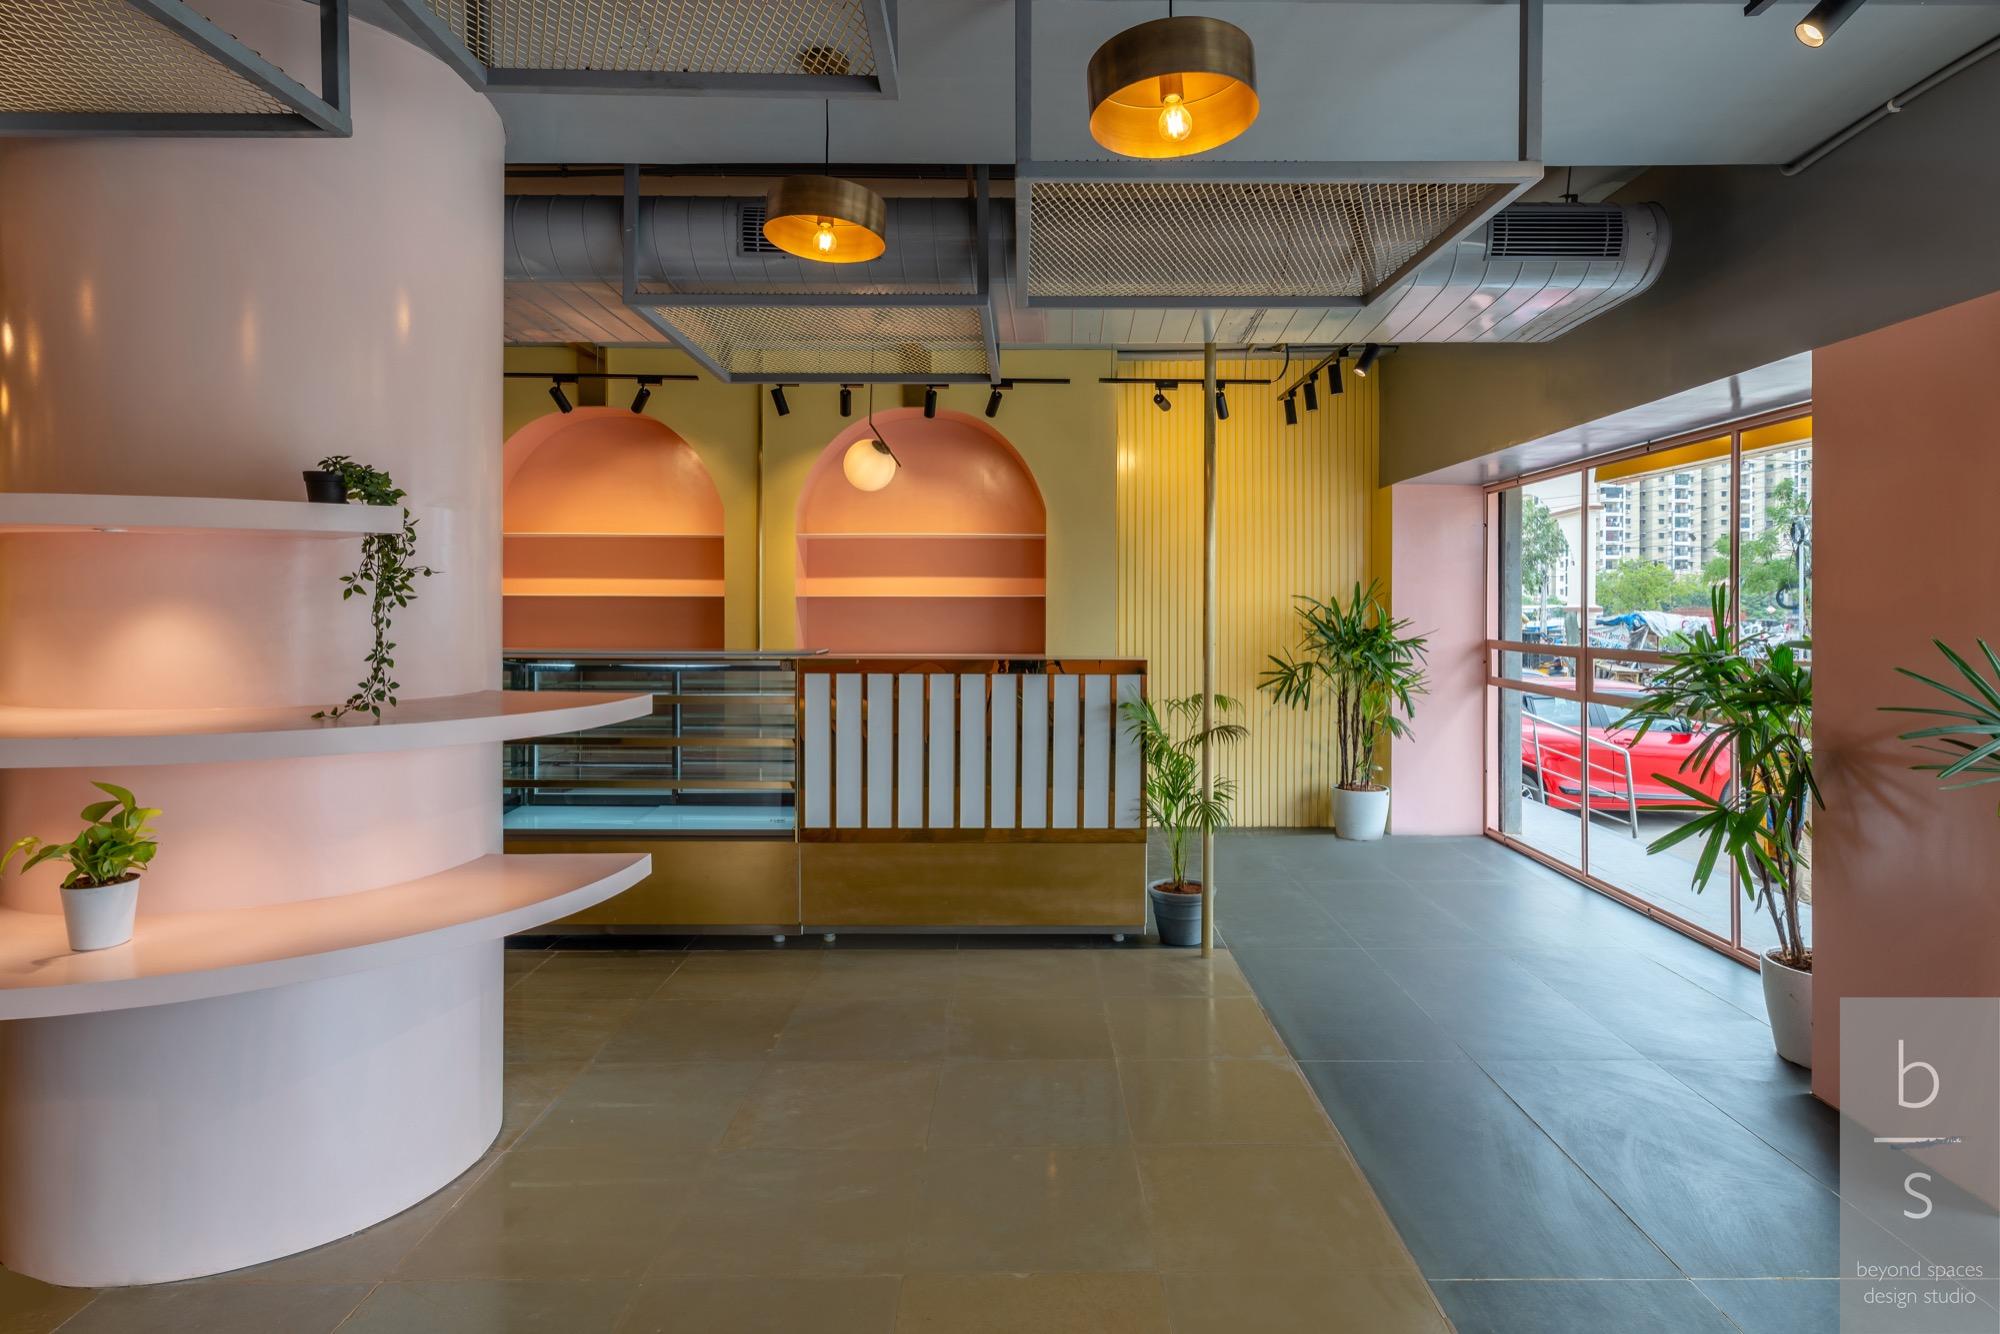 G Pulla Reddy Sweets, interior design by Beyond Spaces Design Studio 21